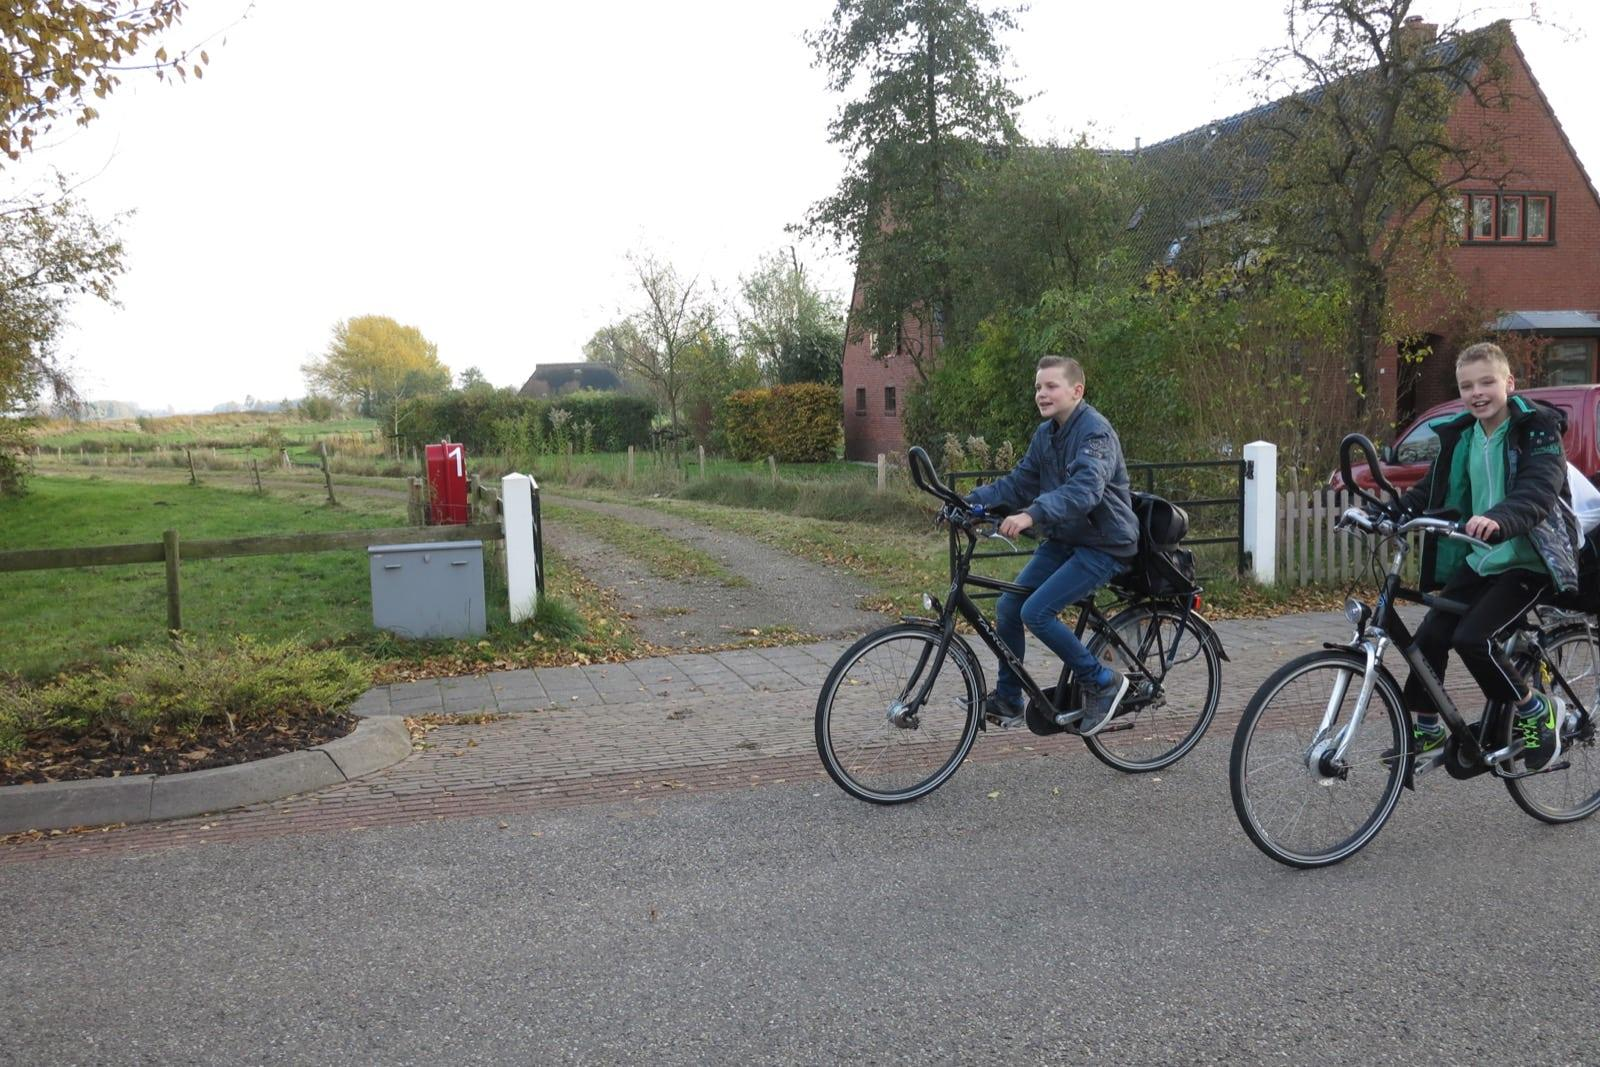 et-fiets-en-fietser-106-steven-ten-cate-en-emiel-ridder-oi.jpg